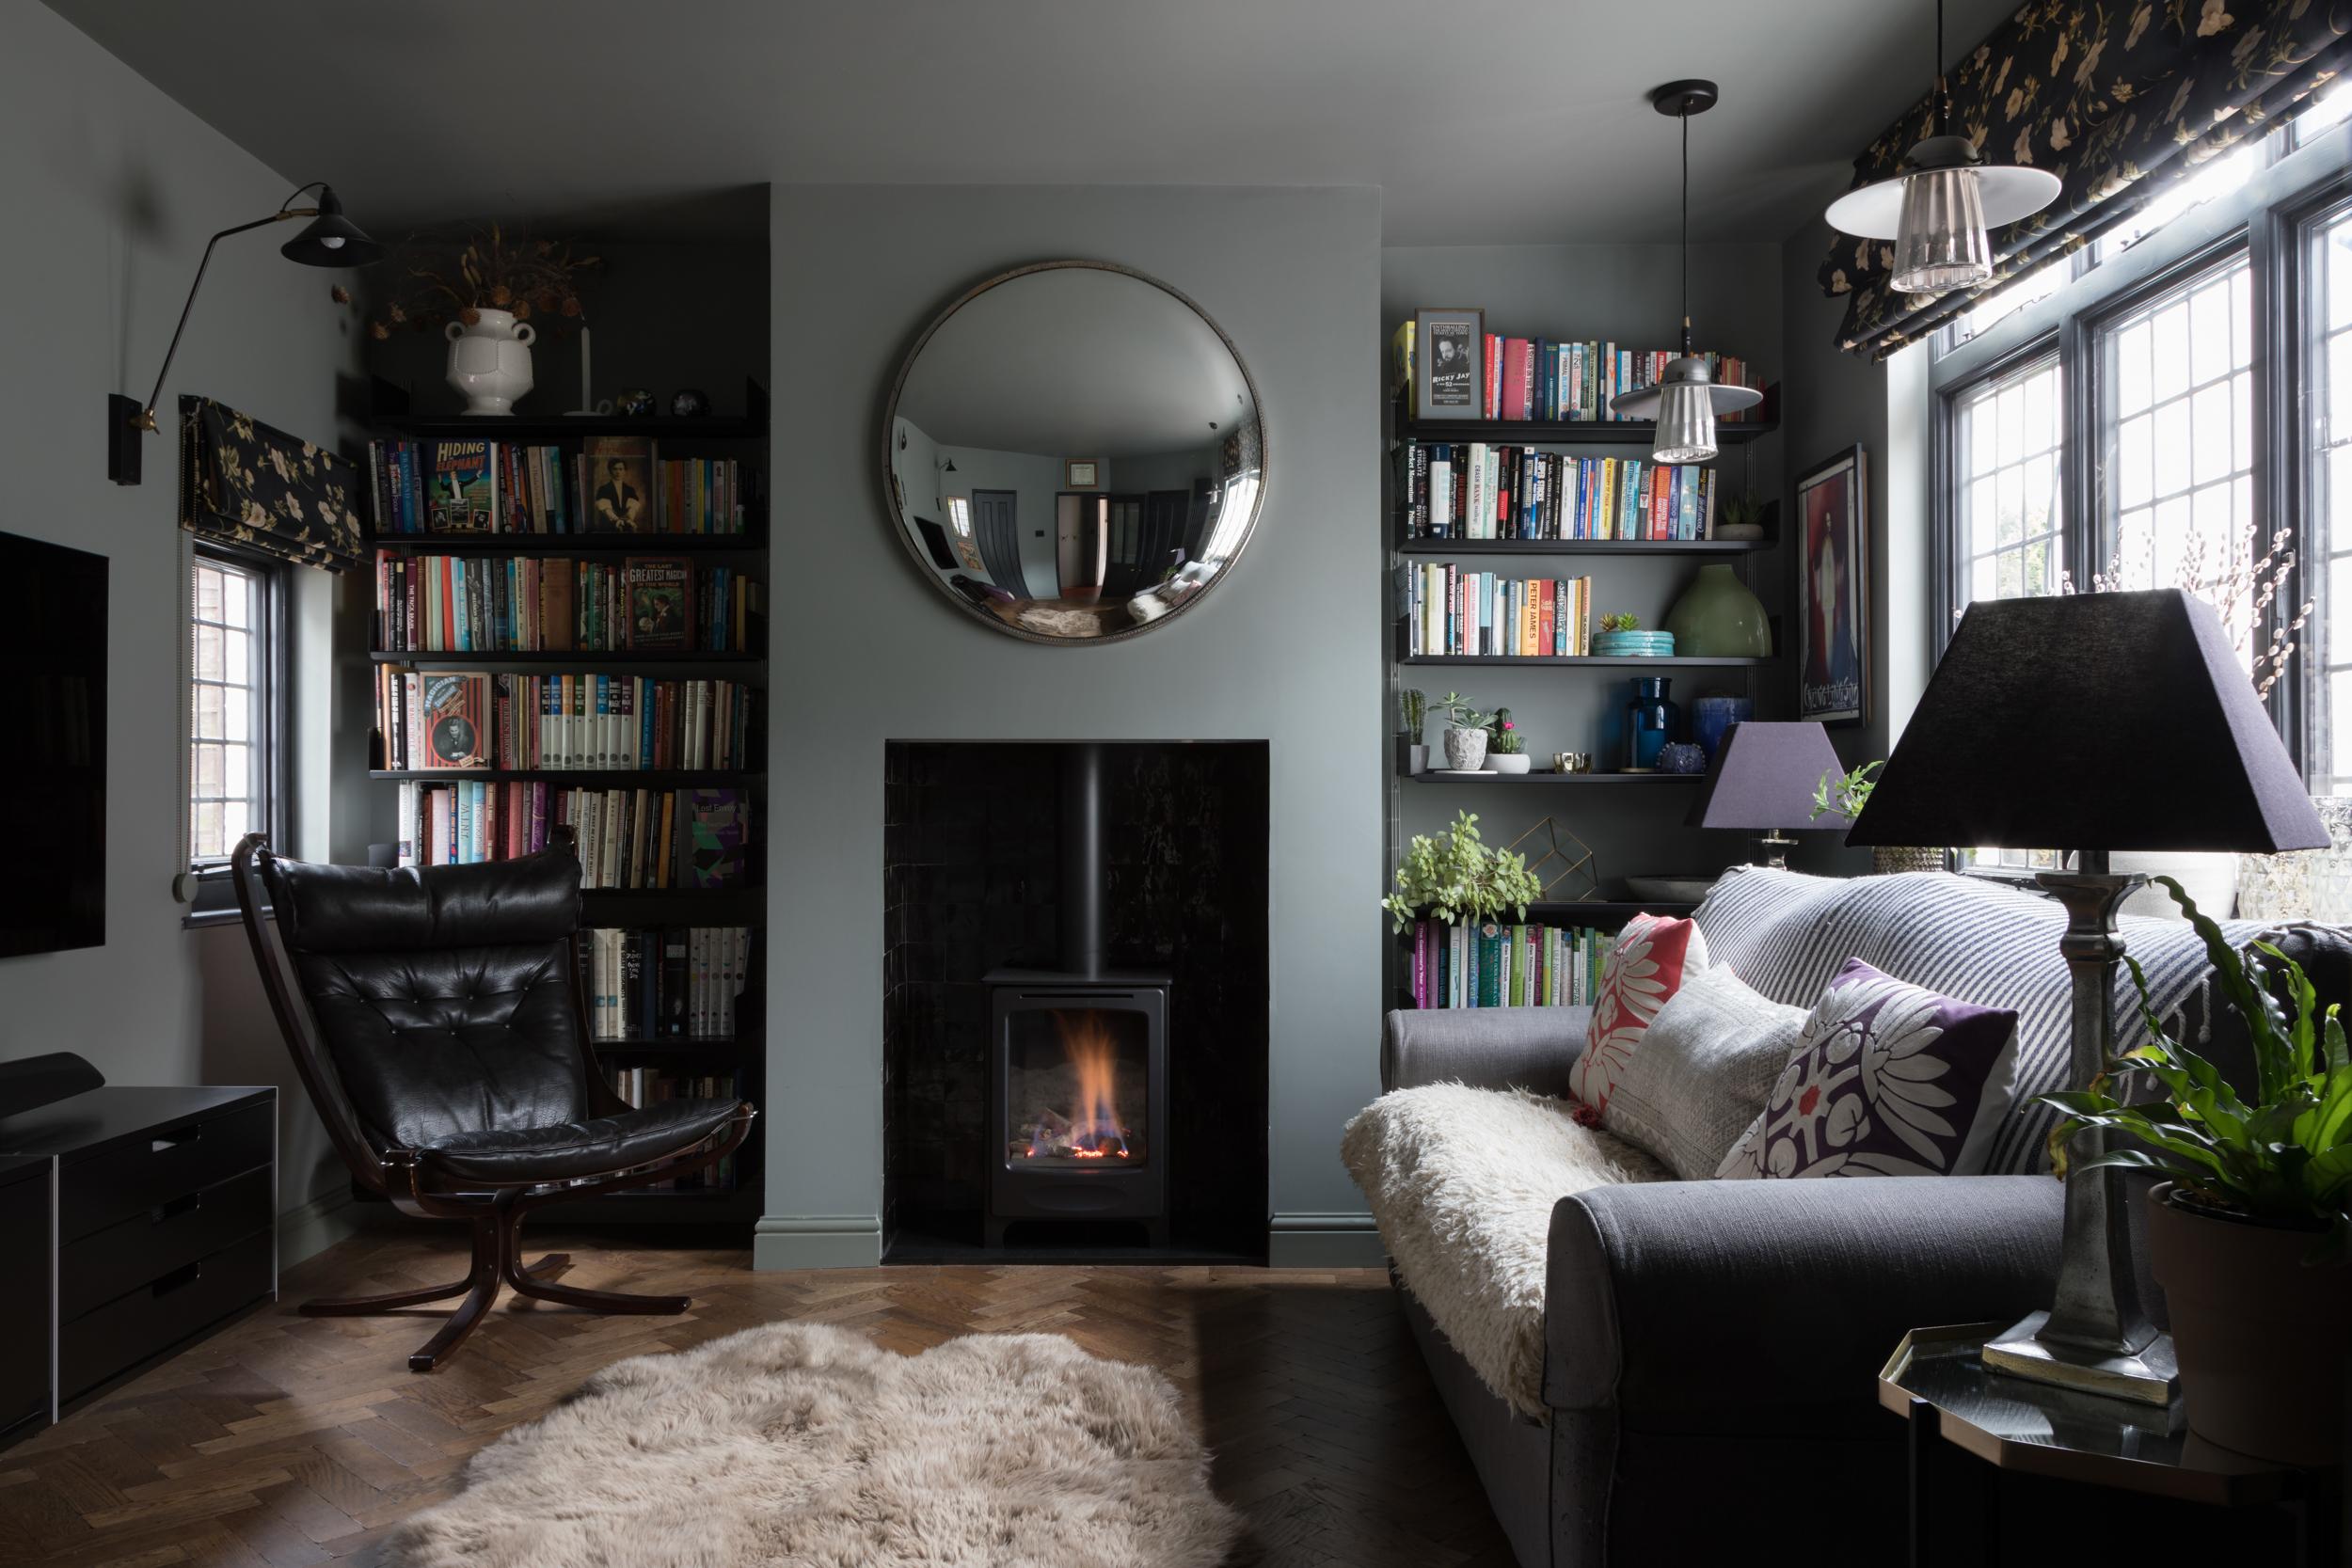 Paul Craig, Interior Photographer, Residential Photography, London, Living Room, Snug